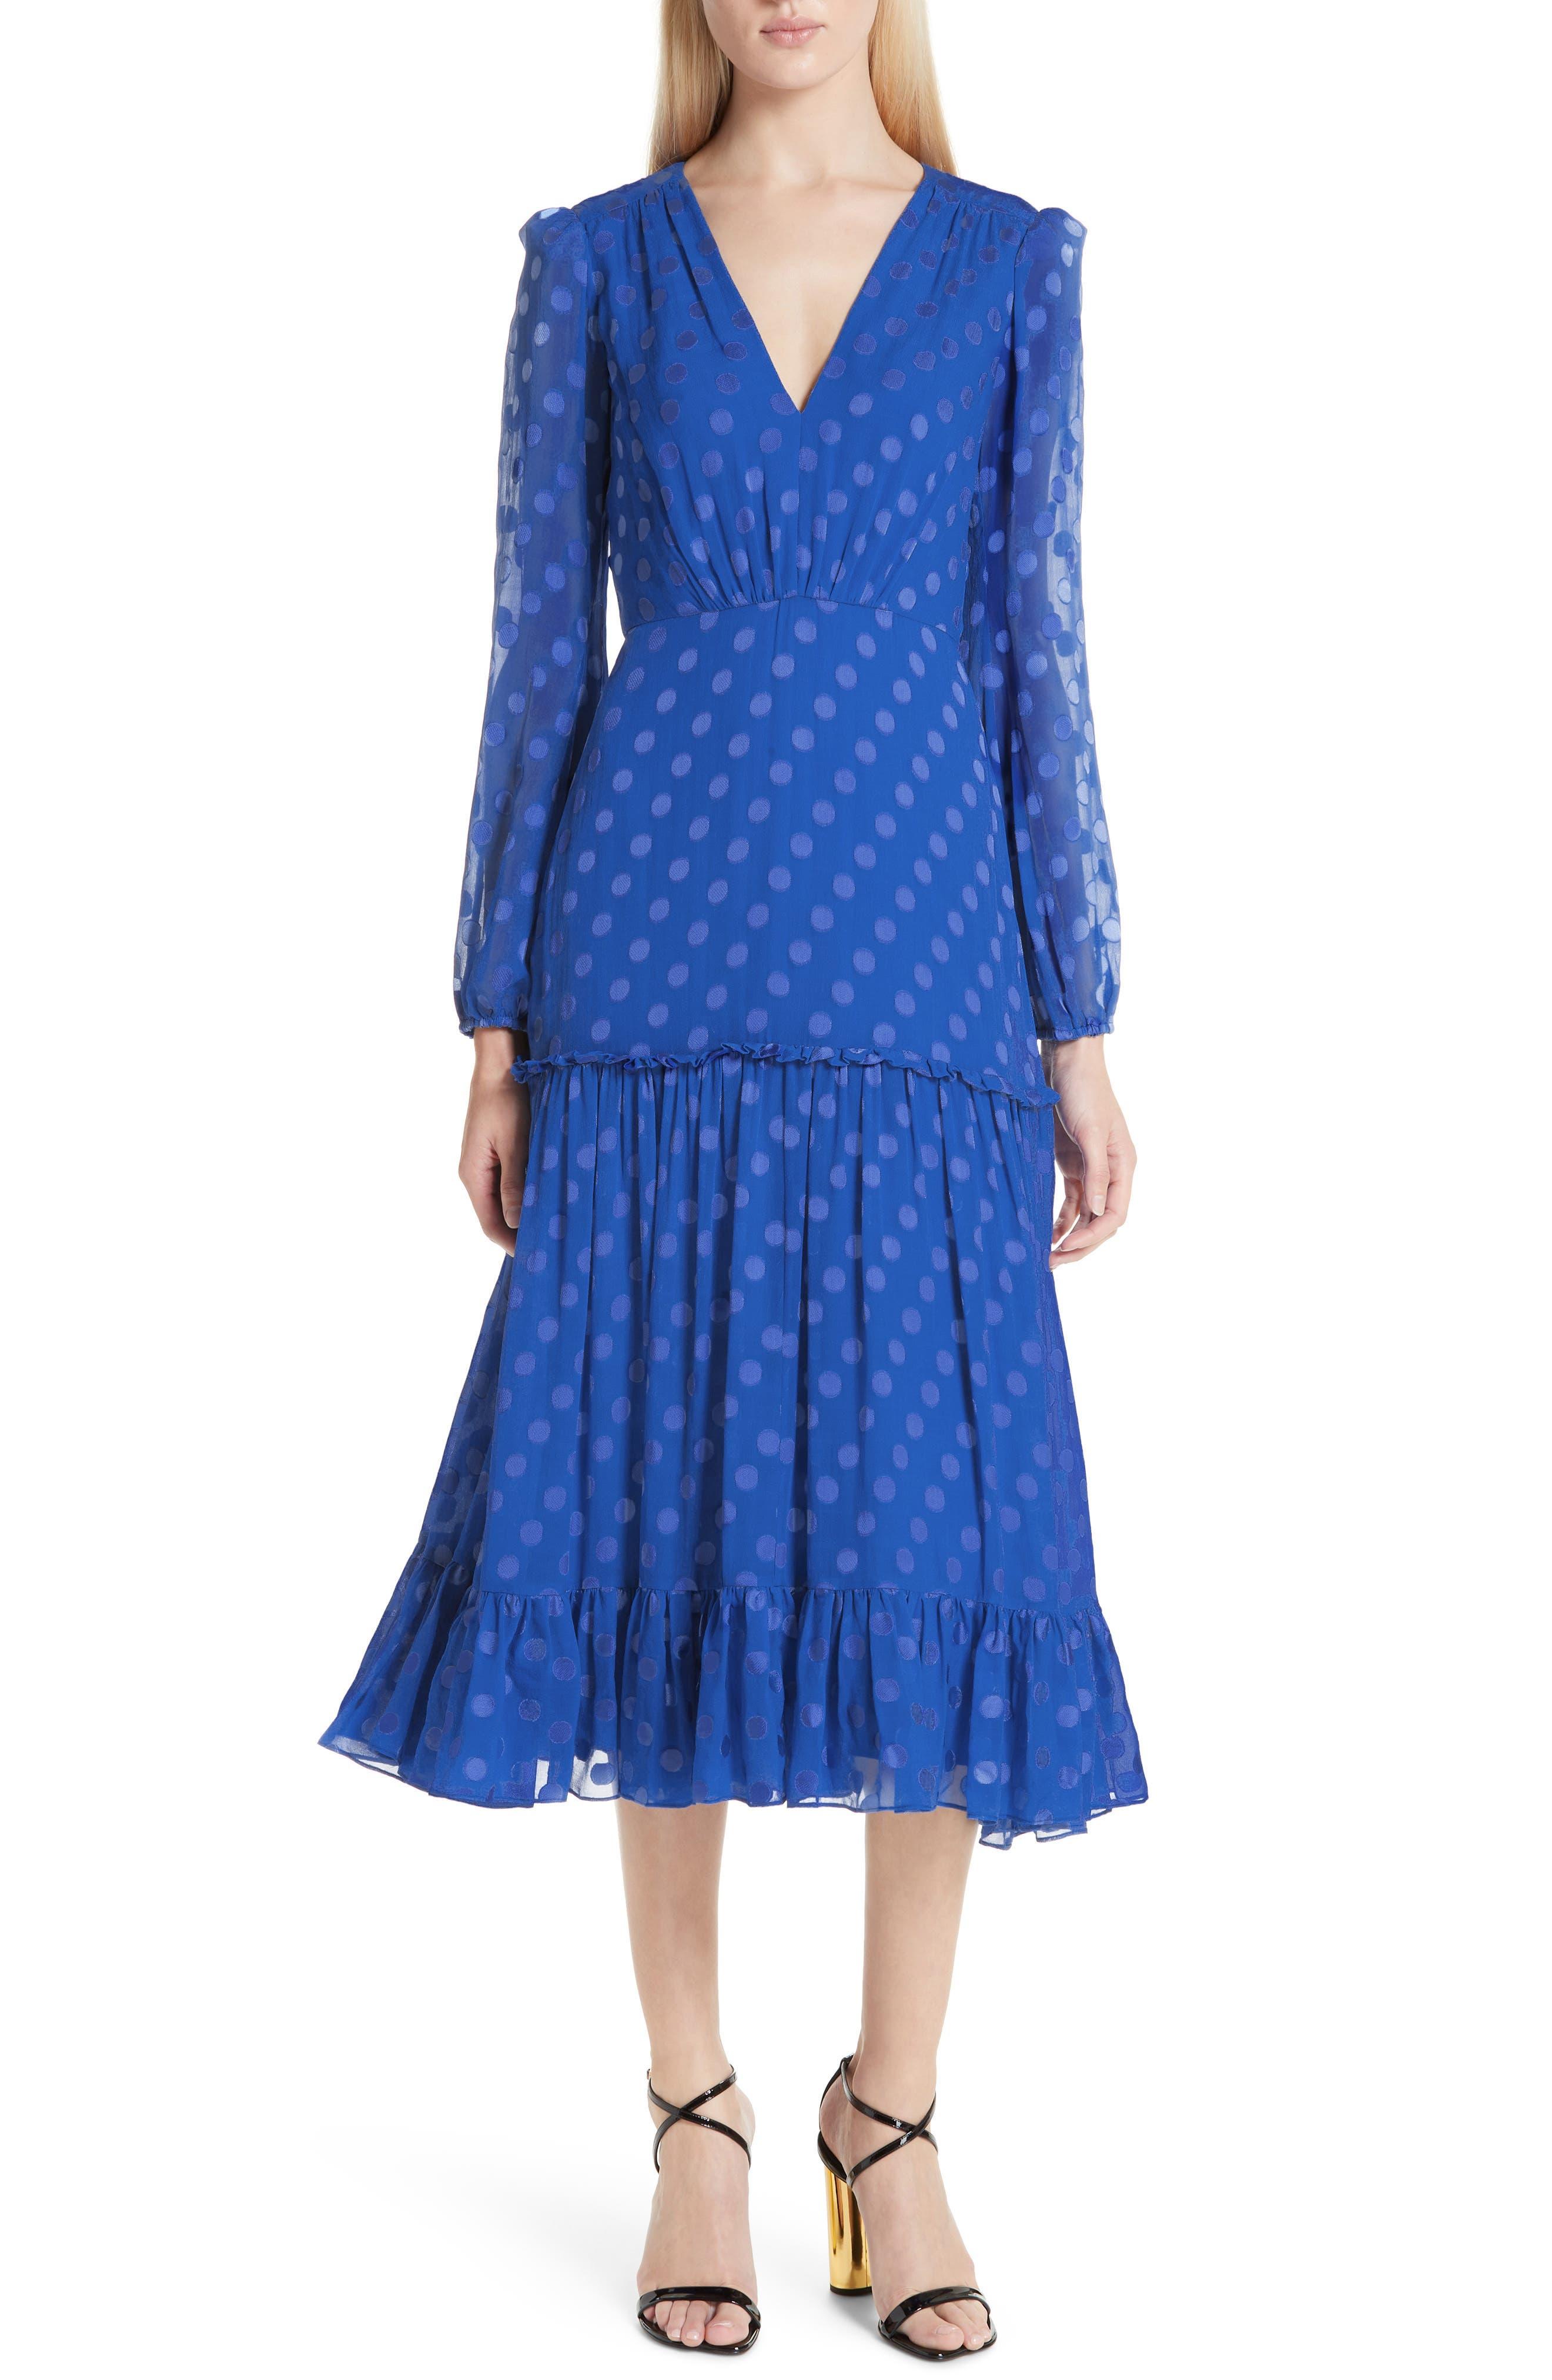 SALONI, Polka Dot Ruffle Dress, Main thumbnail 1, color, COBALT BLUE